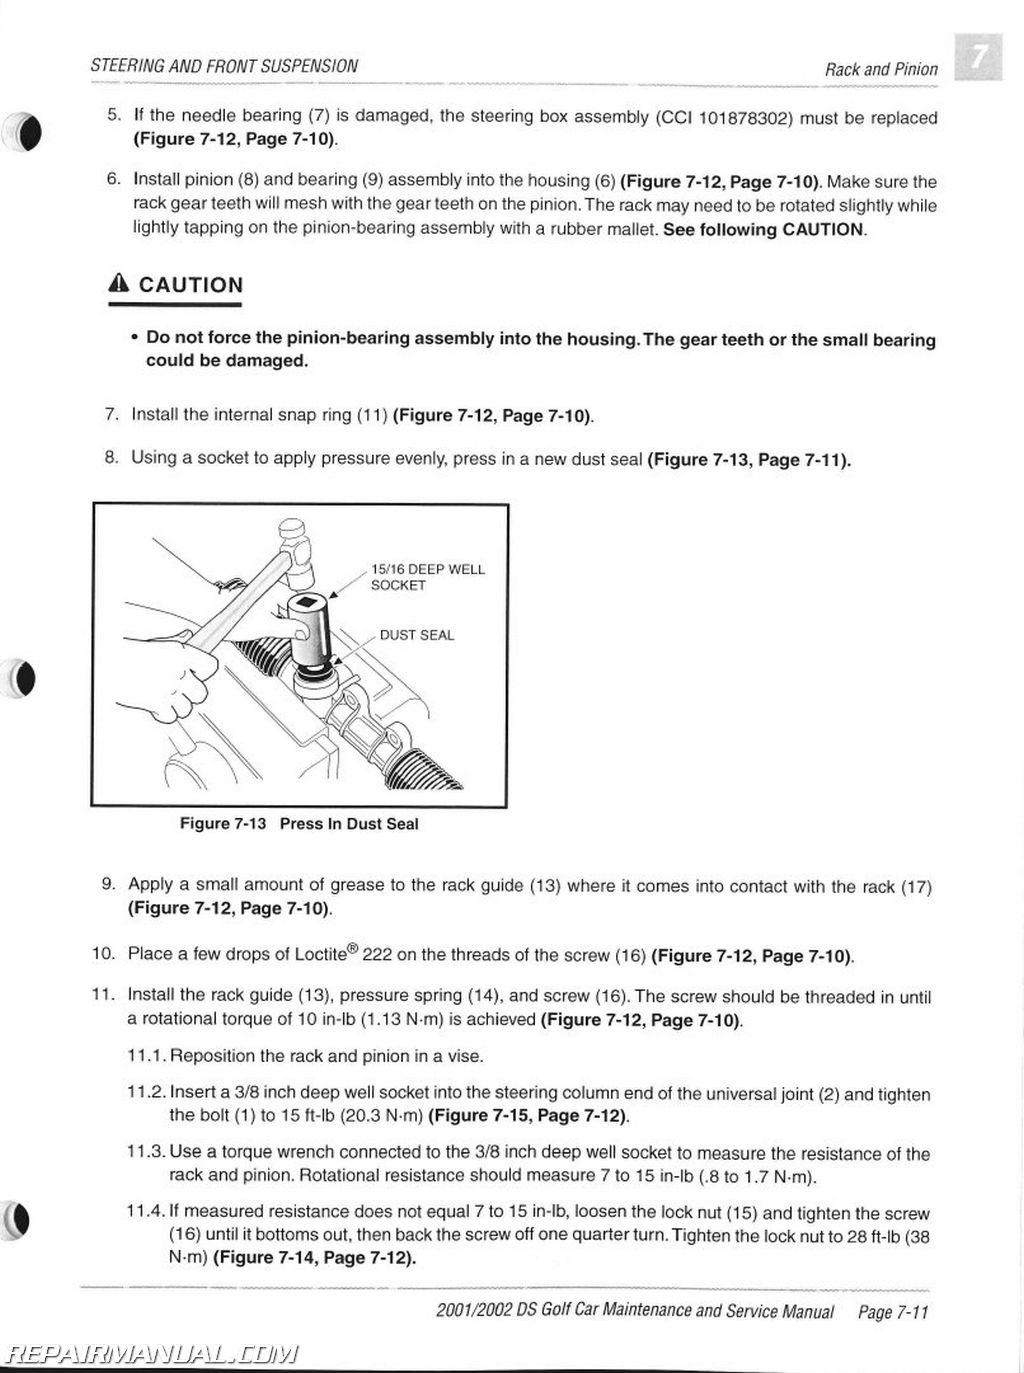 club car maintenance manual knowhedc